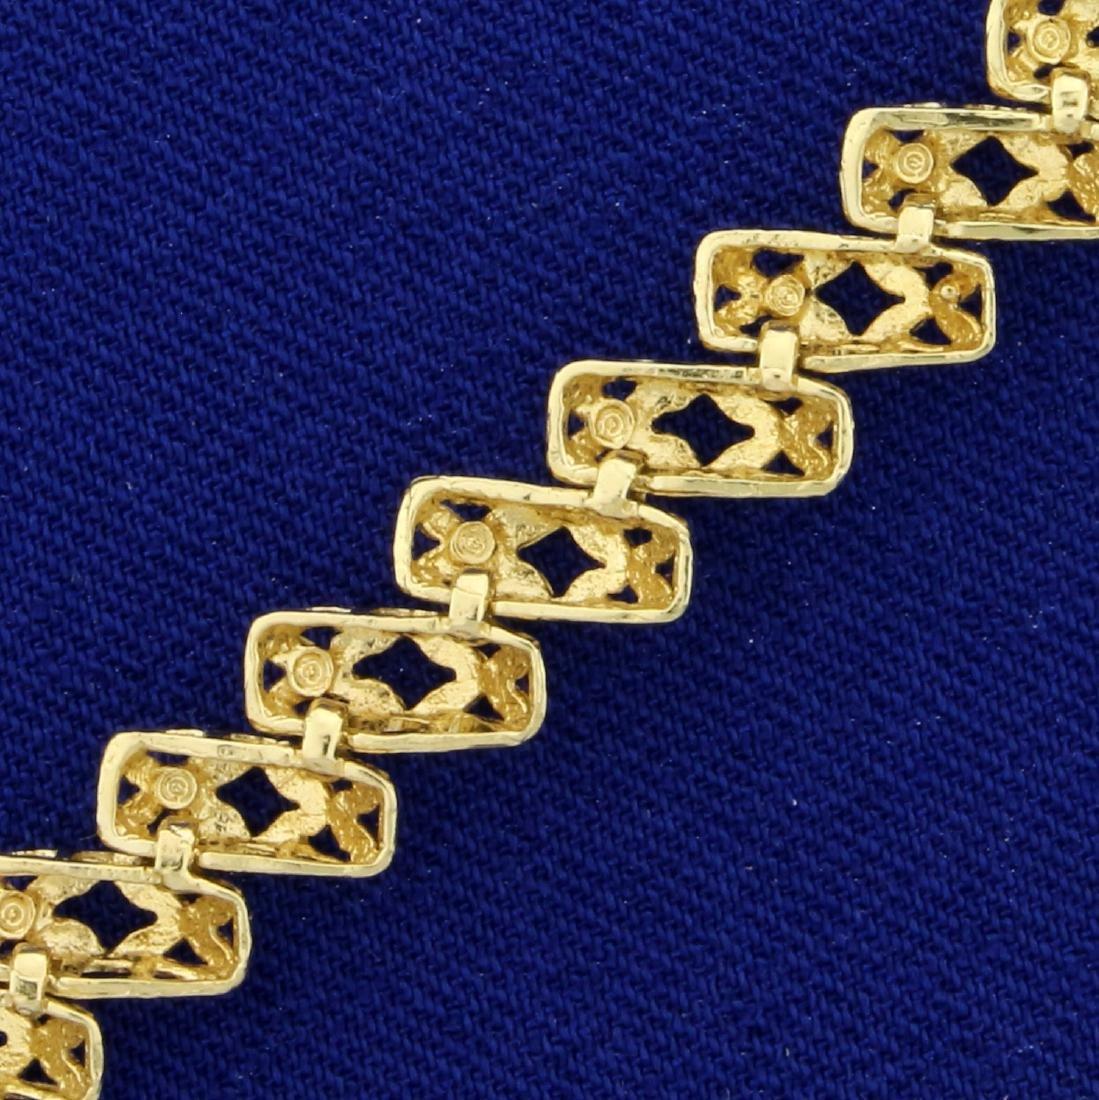 Designer Link Diamond Cut Bracelet in 14K Yellow Gold - 3